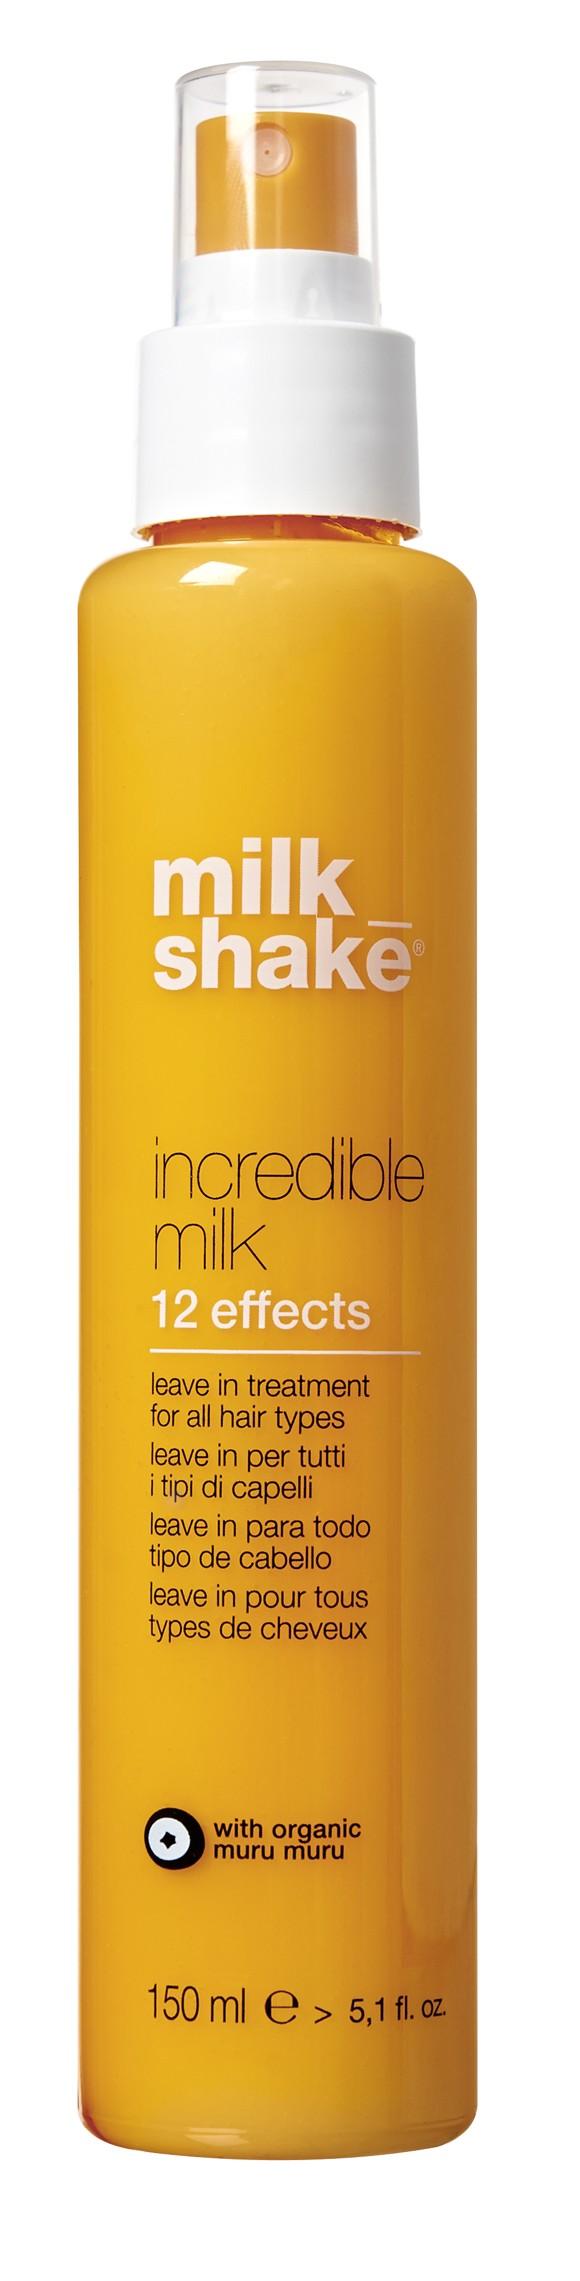 milk_shake - Incredible Milk 12 Effects 150 ml